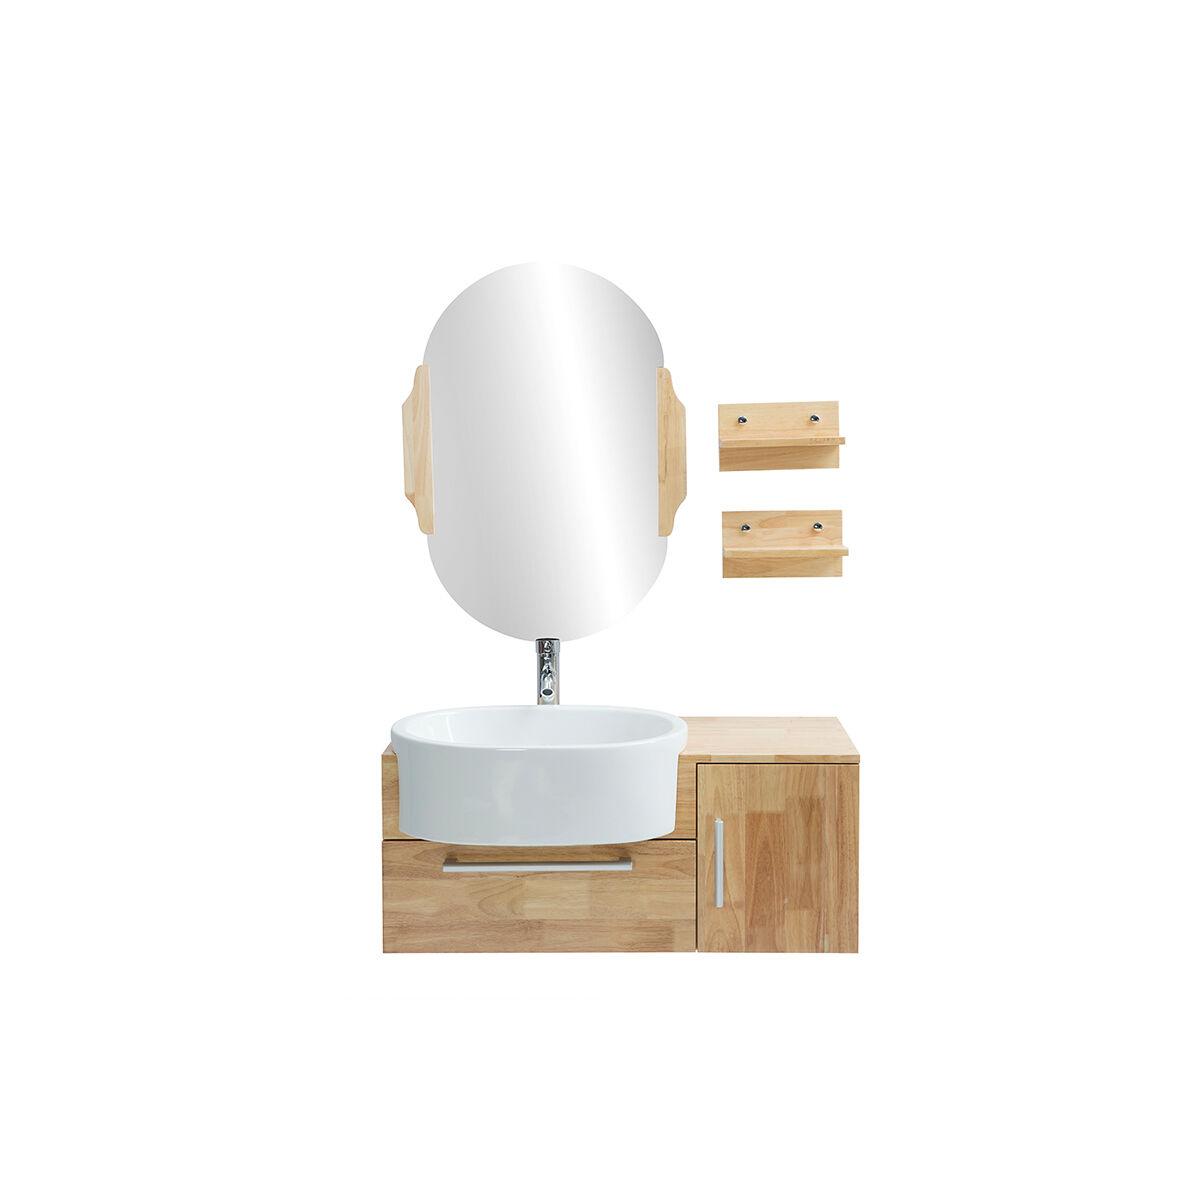 Miliboo Meuble de salle de bain : vasque, meuble sous-vasque, étagères et miroir NIVAN